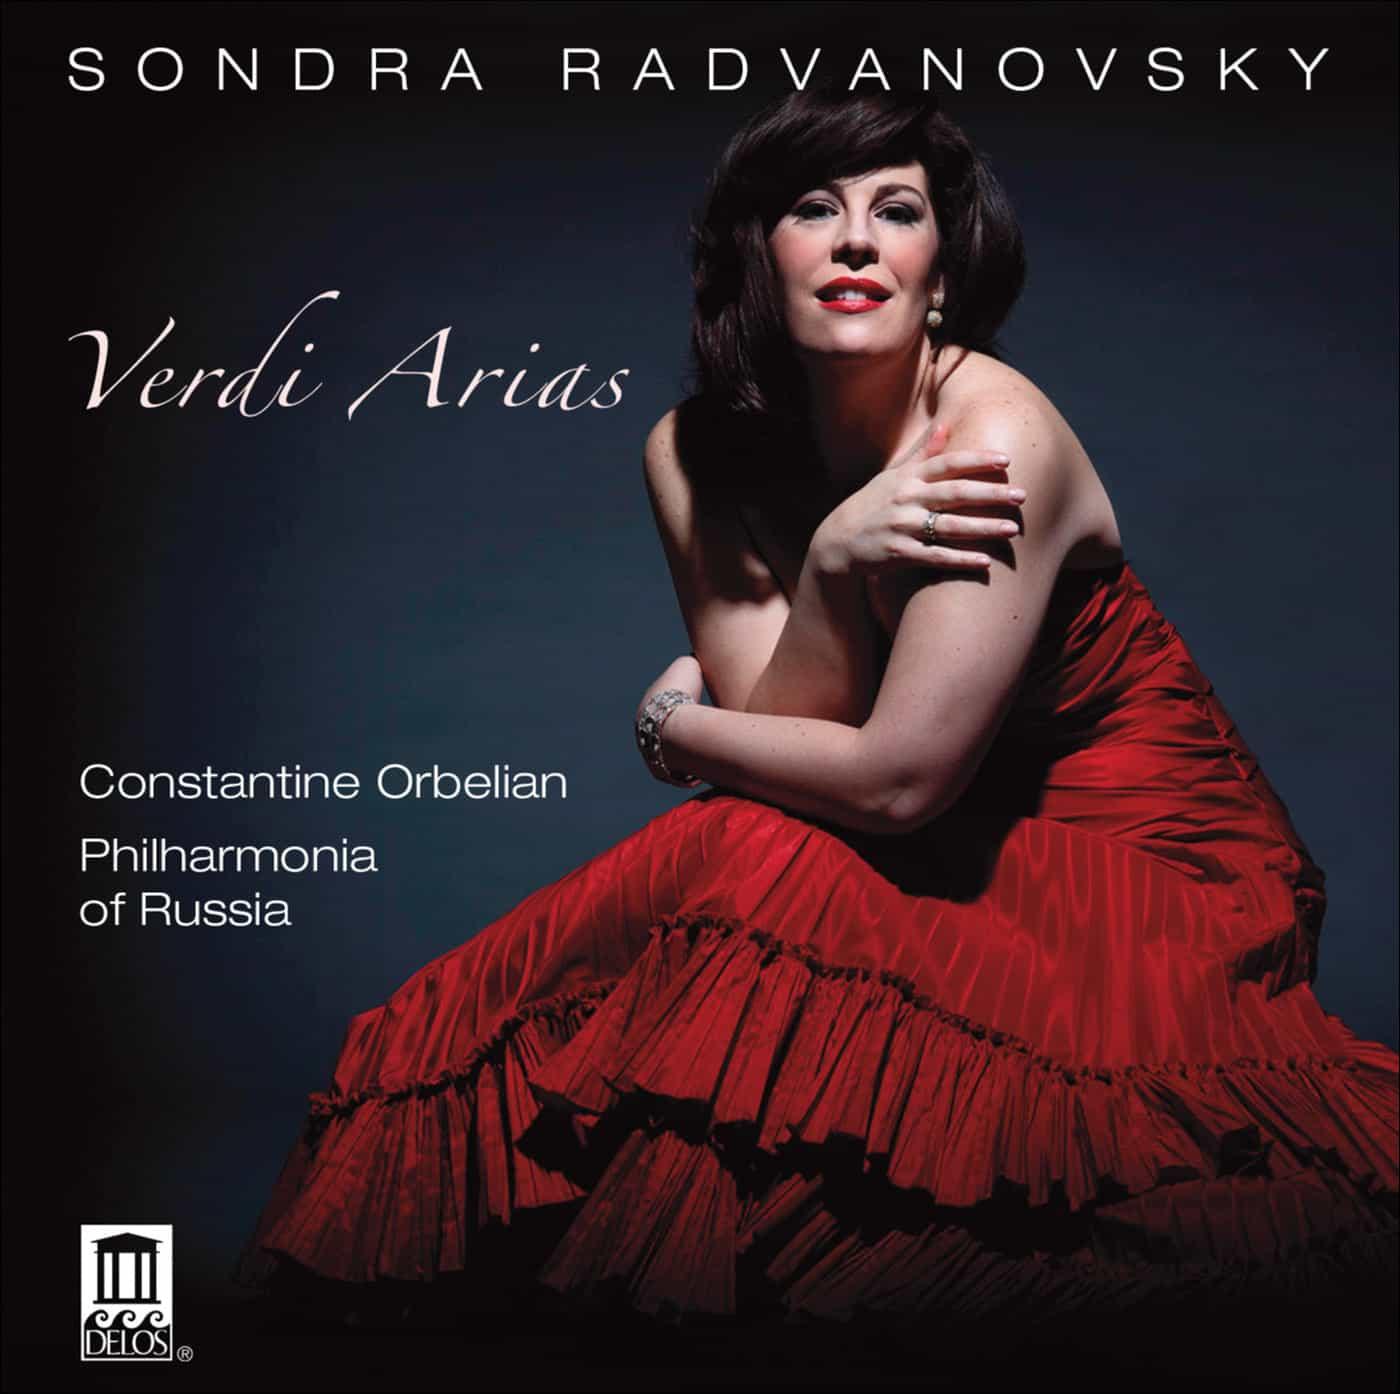 Radvanovsky sings Verdi